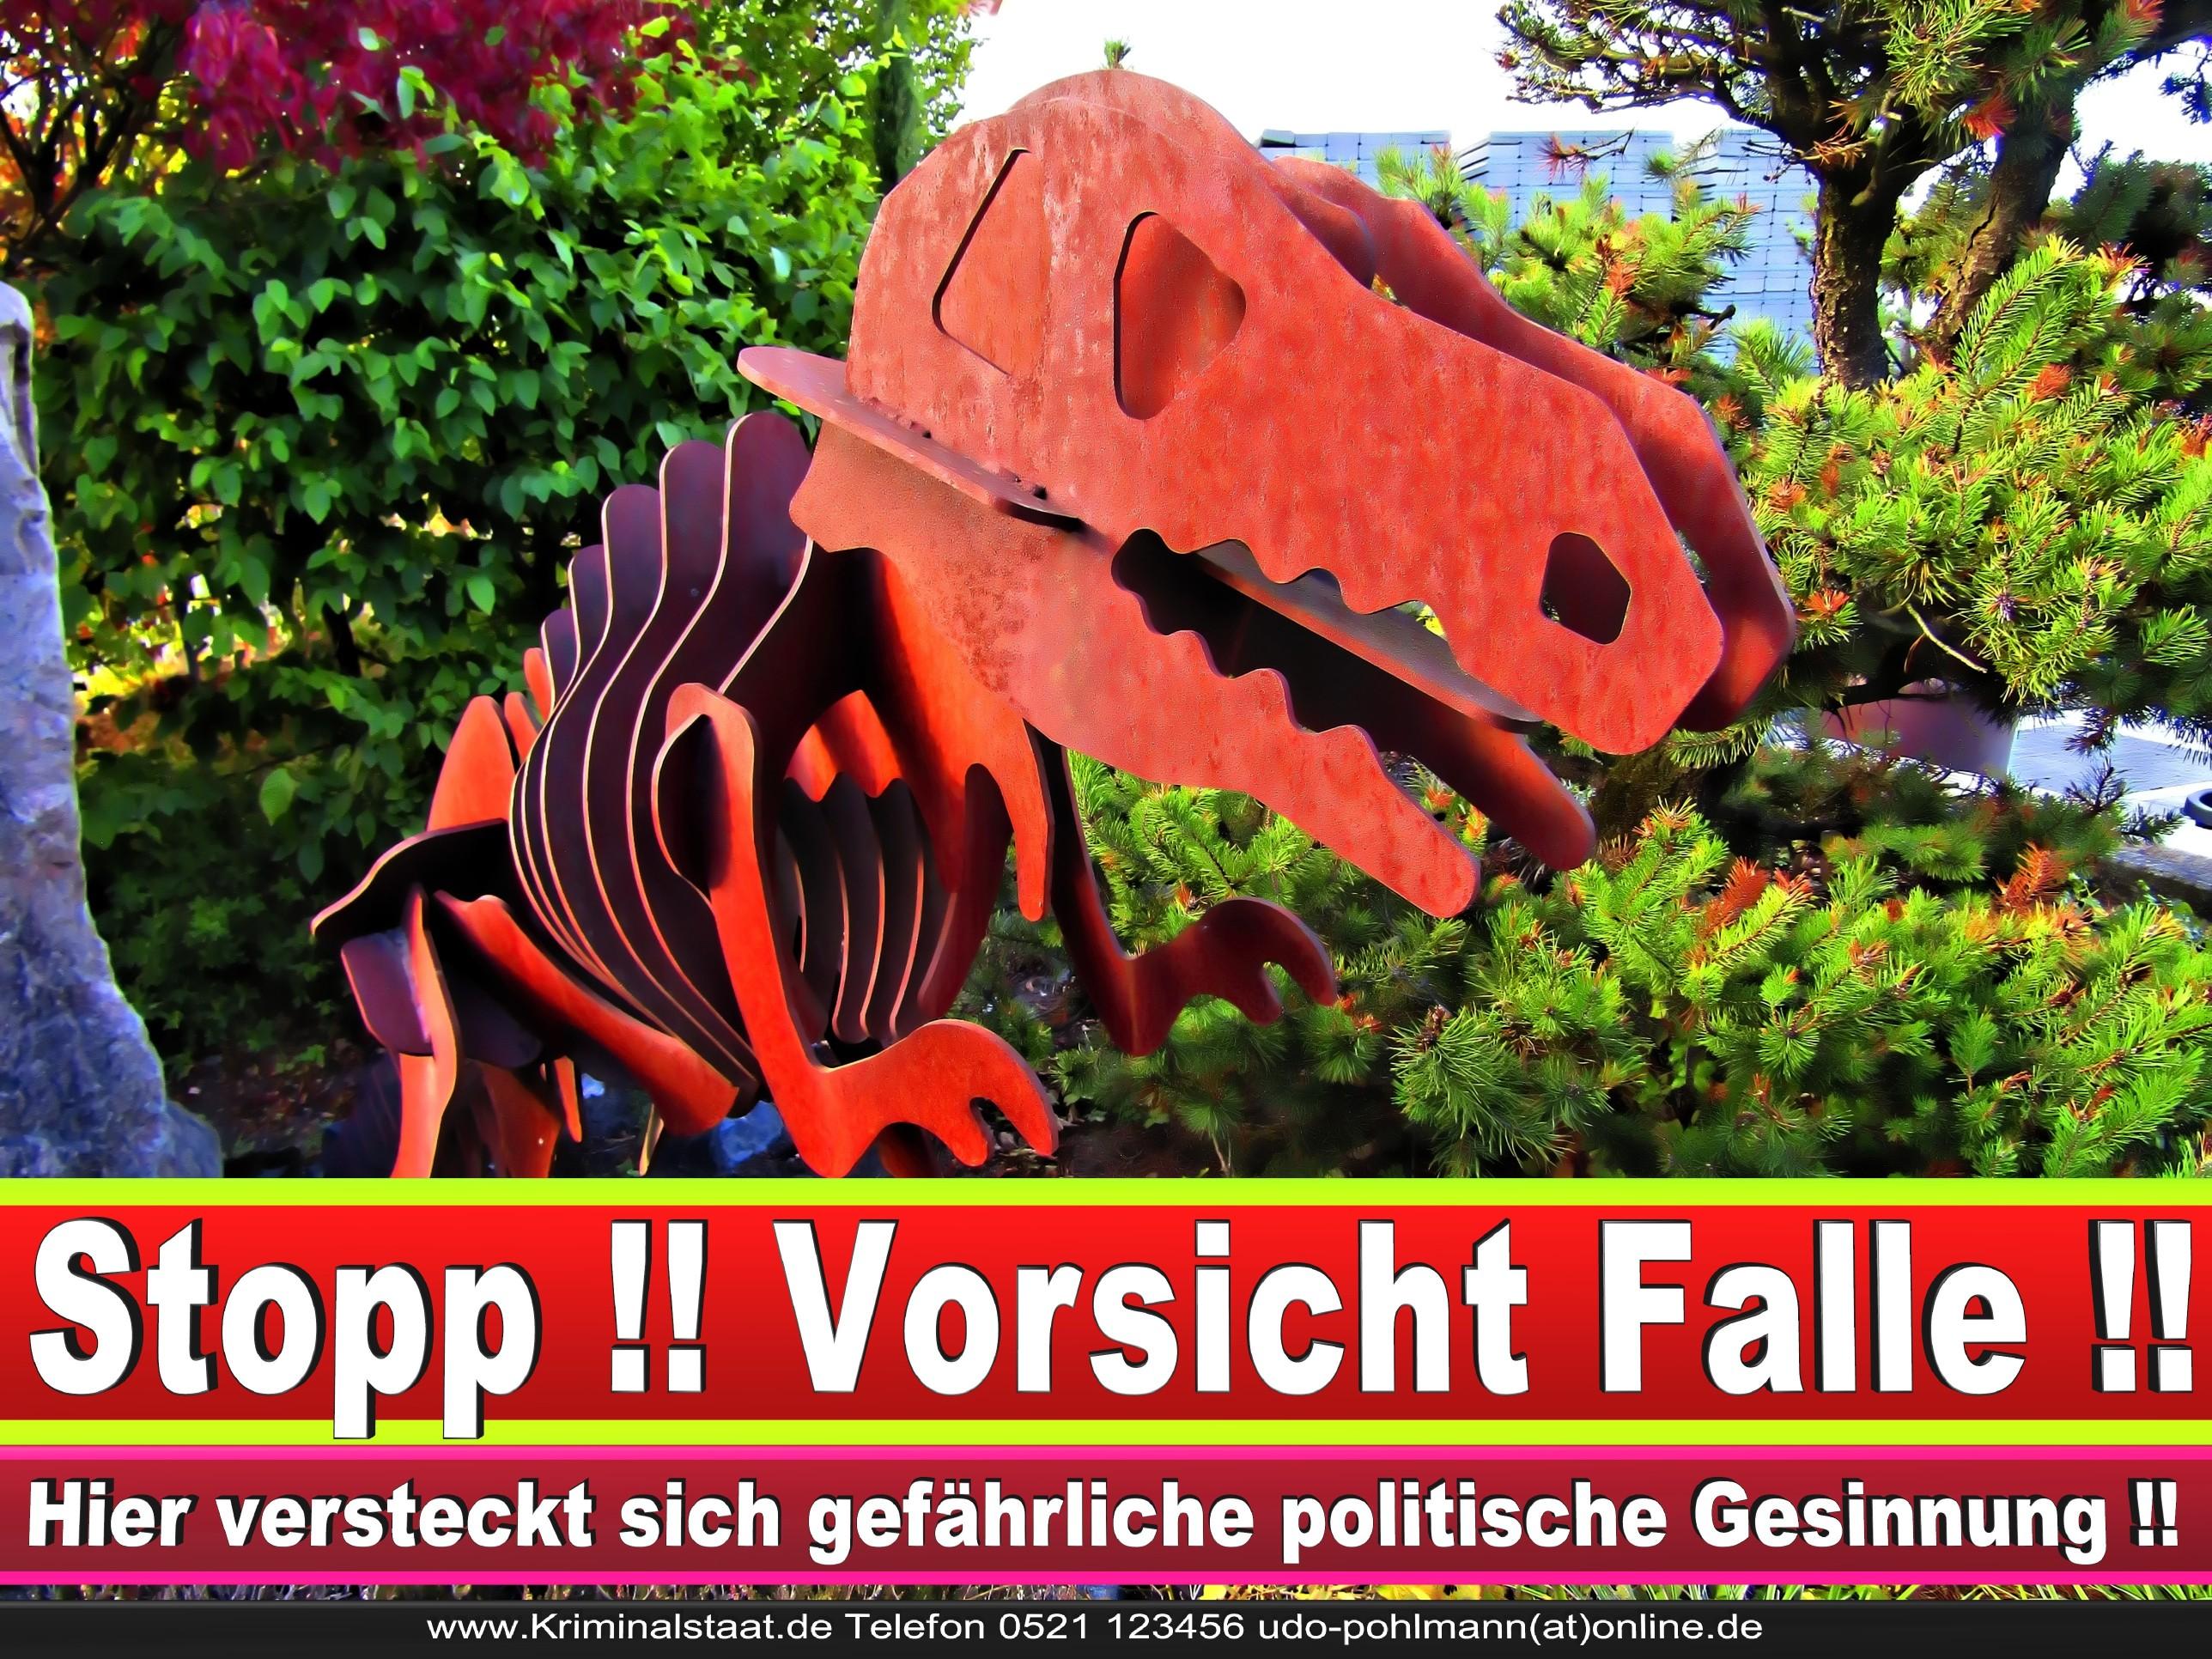 BETONWERK MÜNSTERMANN CDU GÜTERSLOH 1 LANDTAGSWAHL BUNDESTAGSWAHL BÜRGERMEISTERWAHL